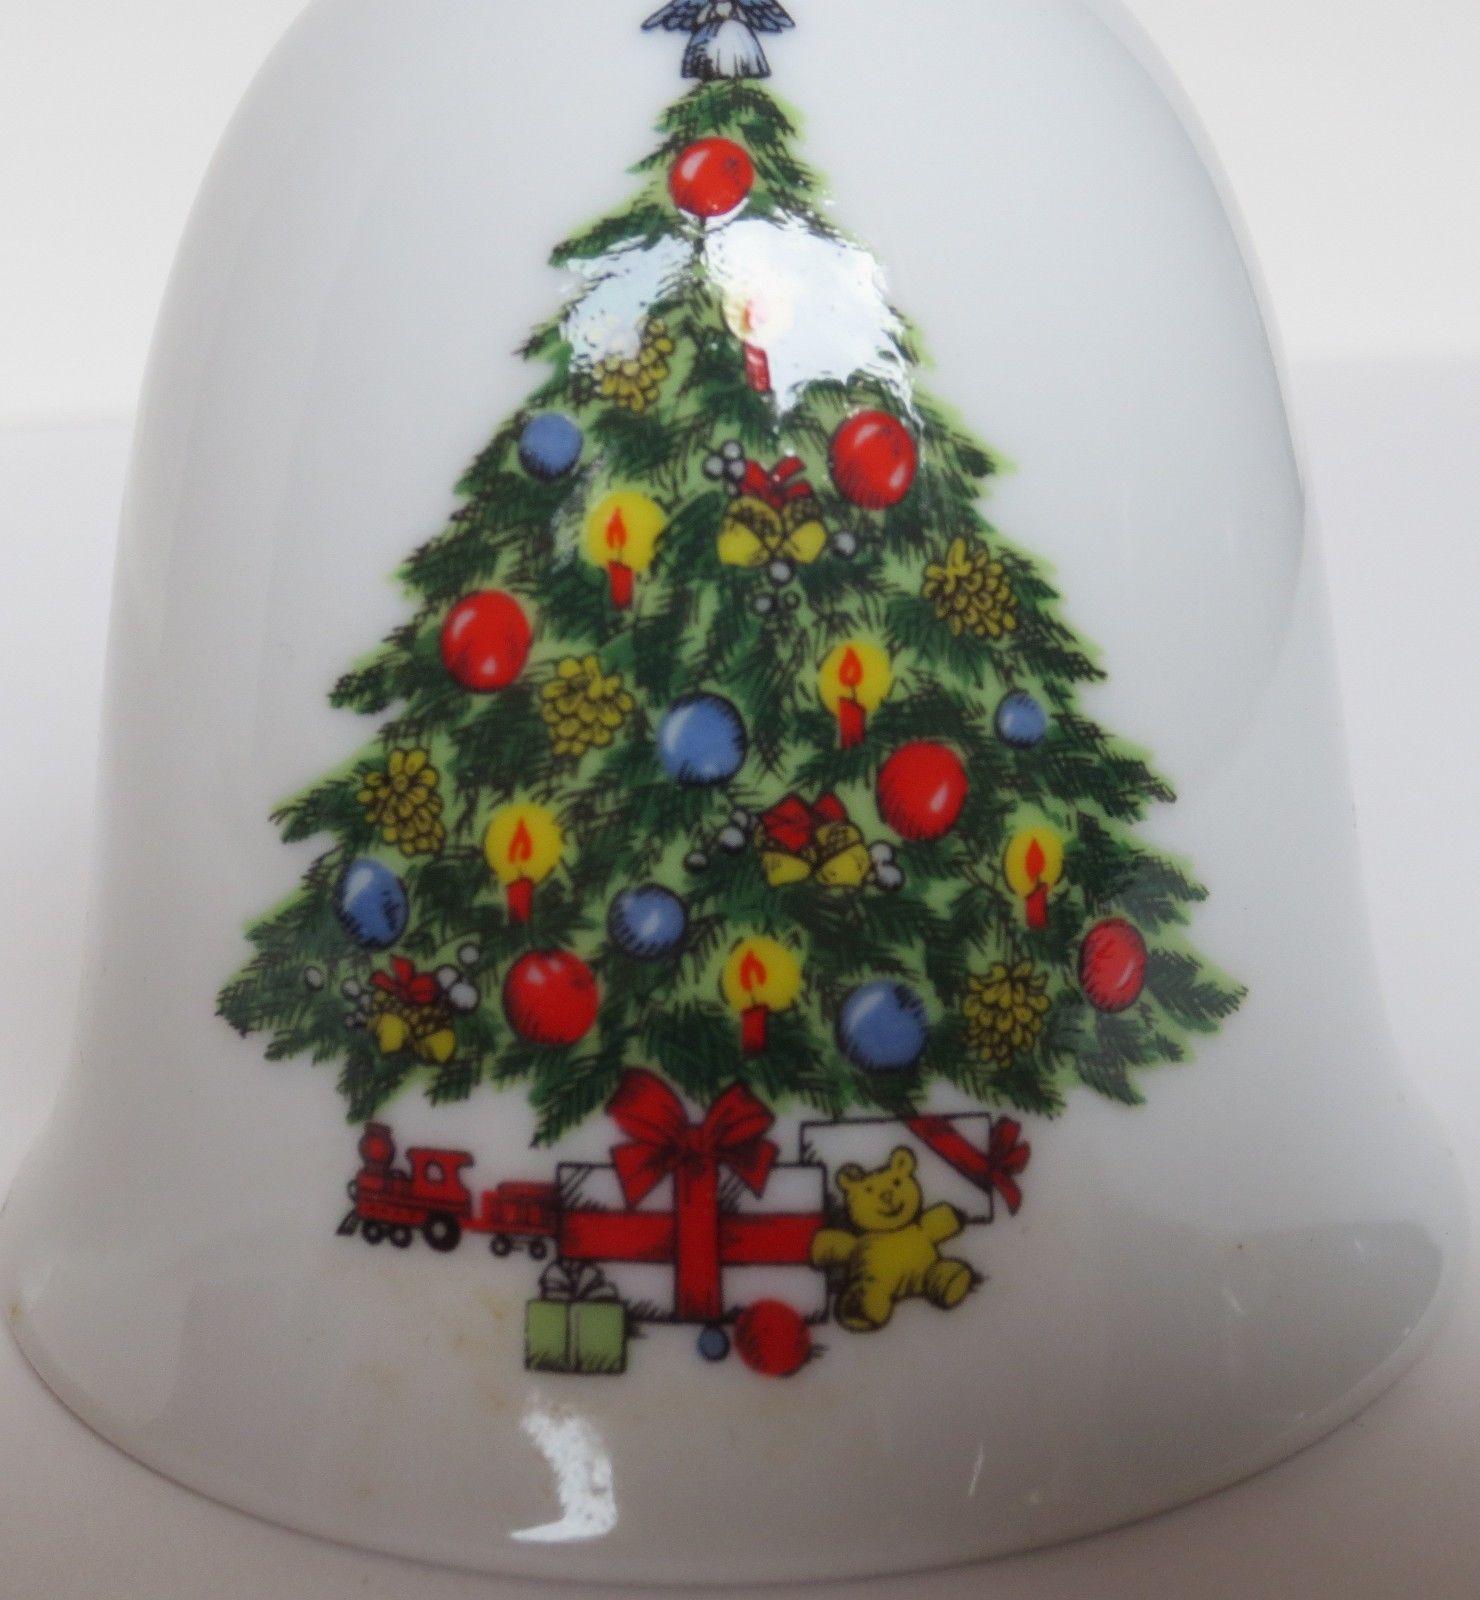 Porcelain & 24 Kt Gold Trim Jamestown China, Christmas Treasure